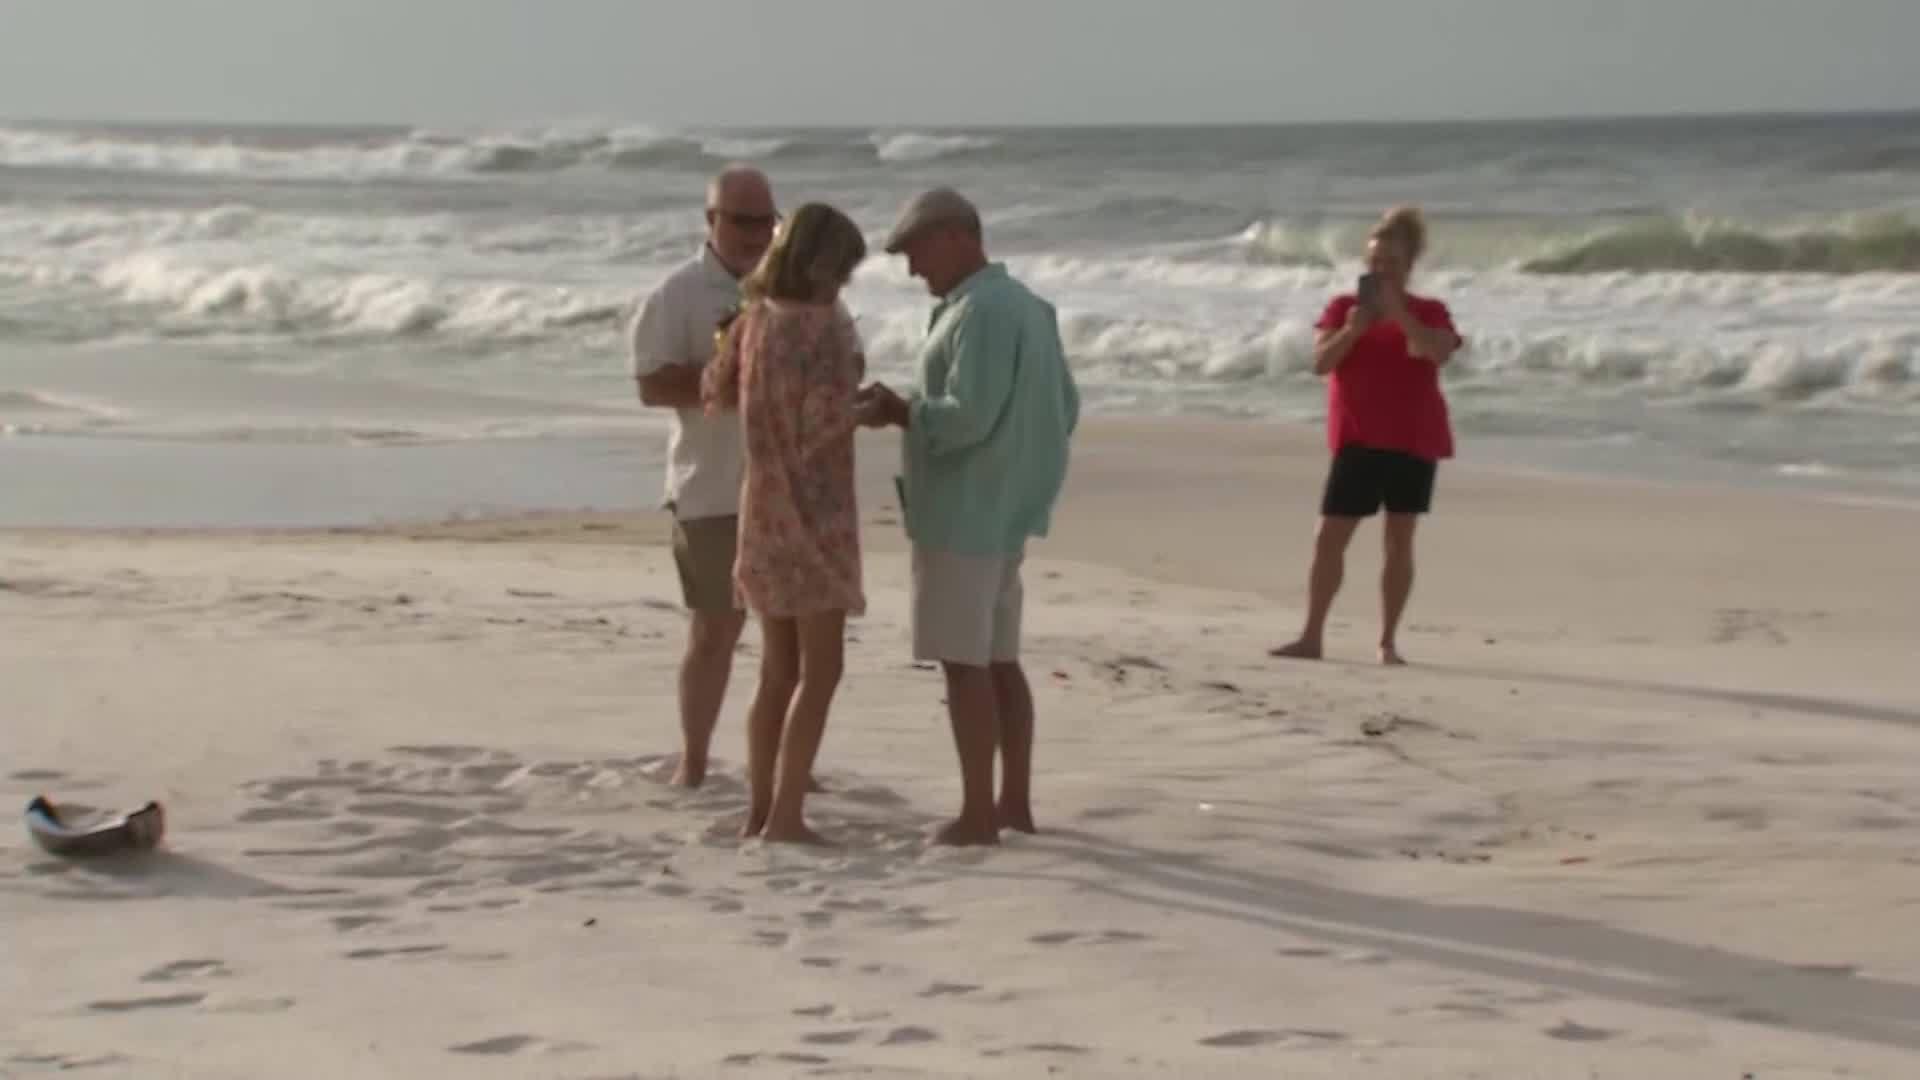 Couple_marries_on_the_beach_before_Hurri_0_20181010034216